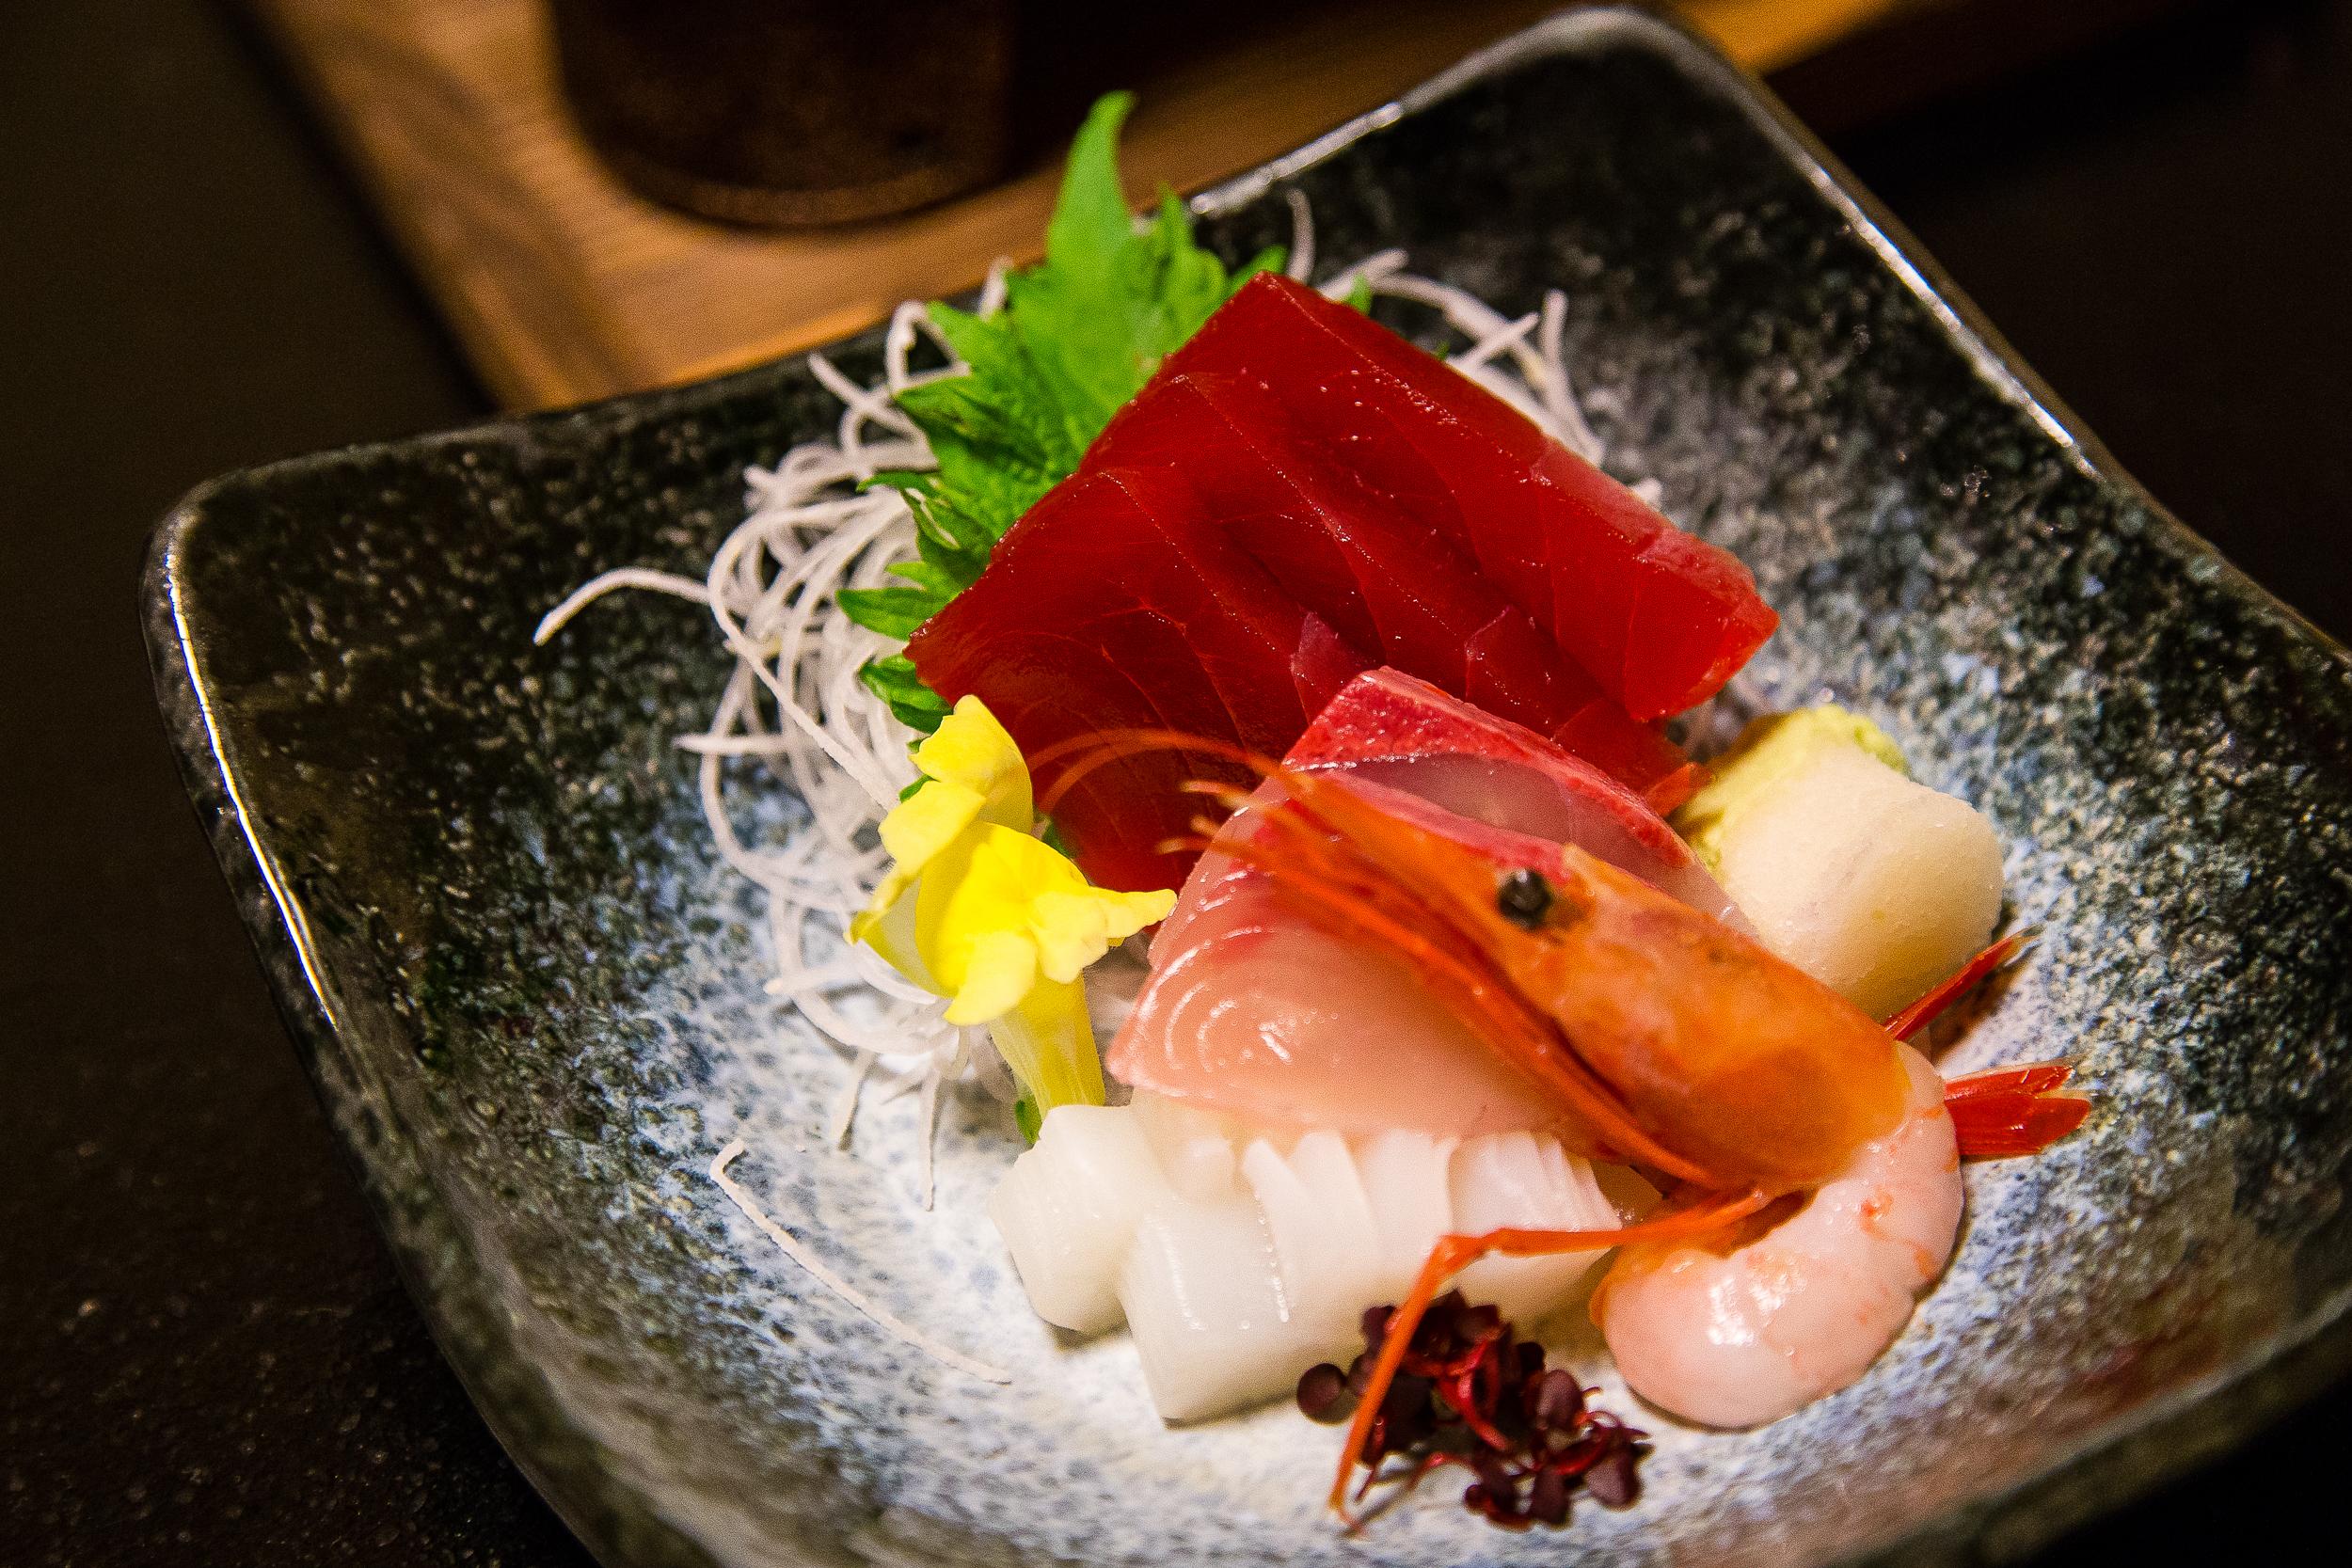 Sashimi. The bottom white is ika (squid) which was in season.